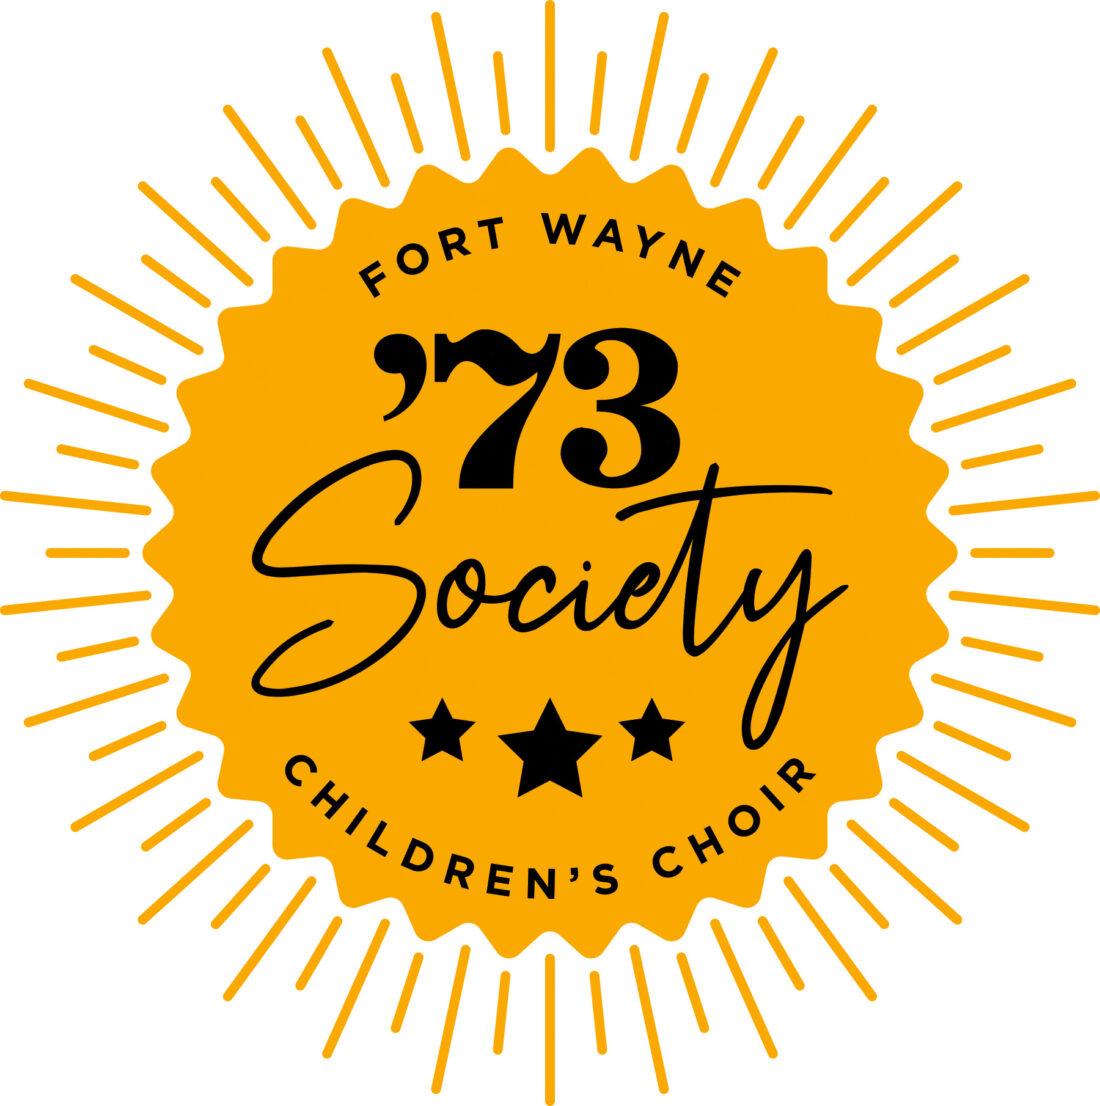 fort wayne children's choir '73 society logo design